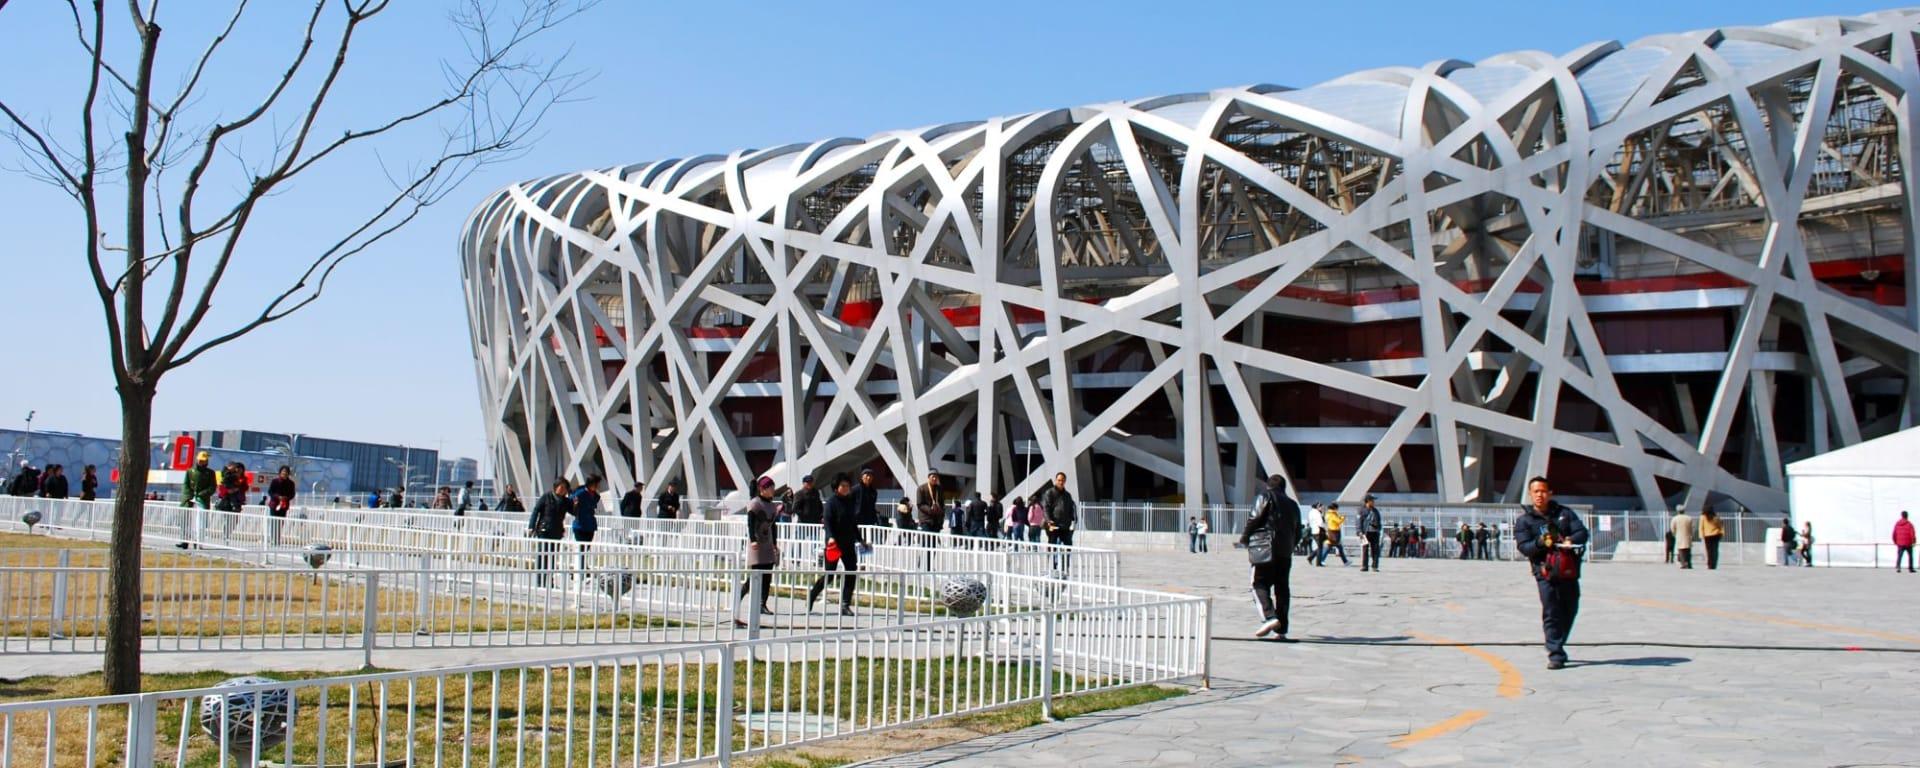 Glanzlichter Chinas mit dem Zug ab Peking: Beijing Olympia Stadion Bird's Nest